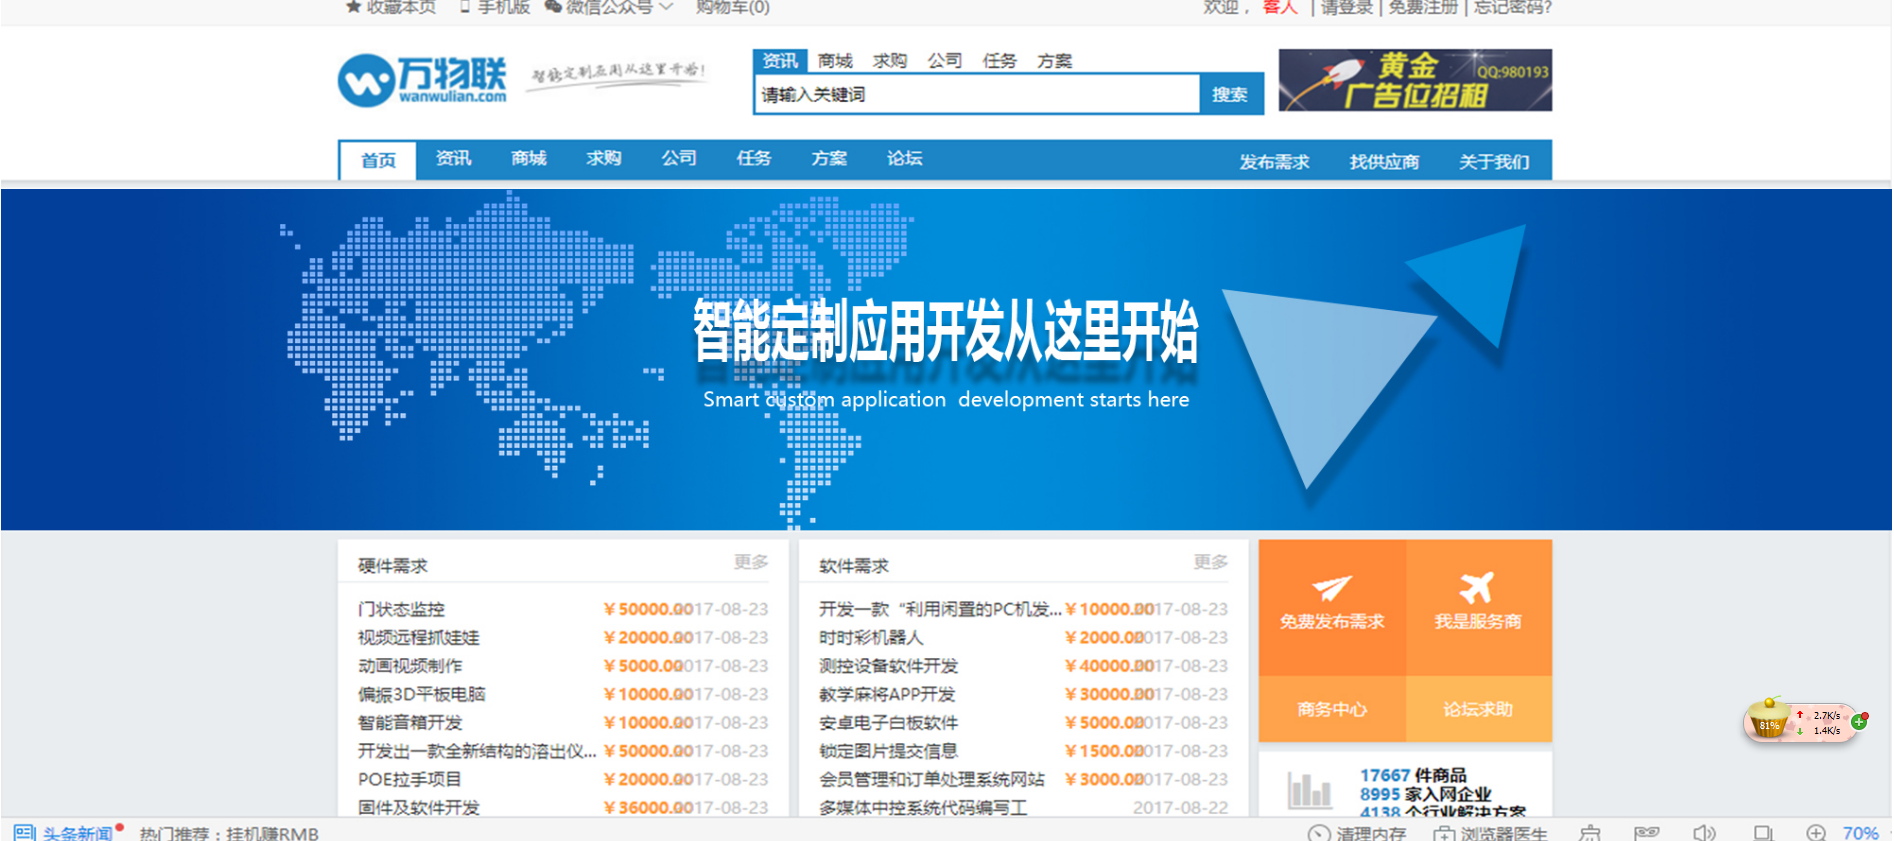 网站banner设计最重要的关键点,网站banner设计要求